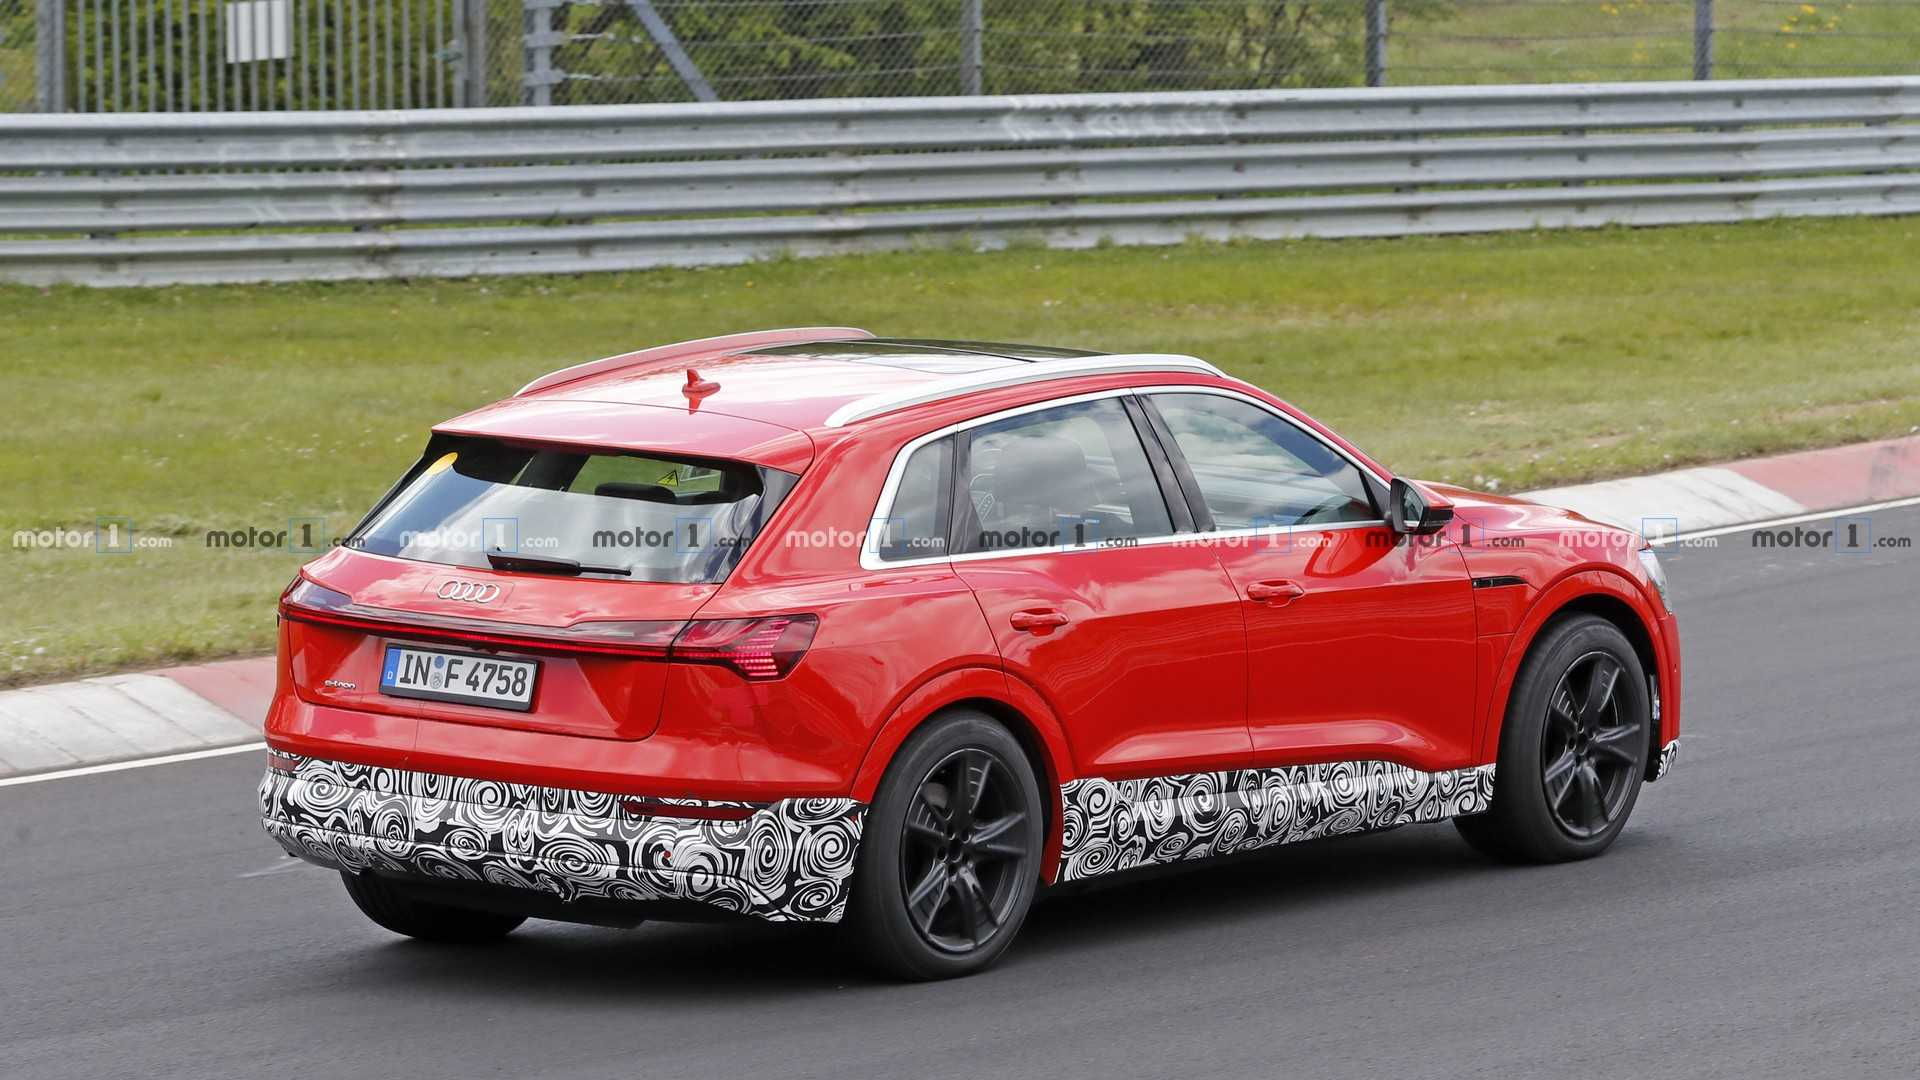 2020 Audi Q6 Rumors, E-Tron, Release Date >> Audi E Tron Quattro S Spied At The Nurburgring